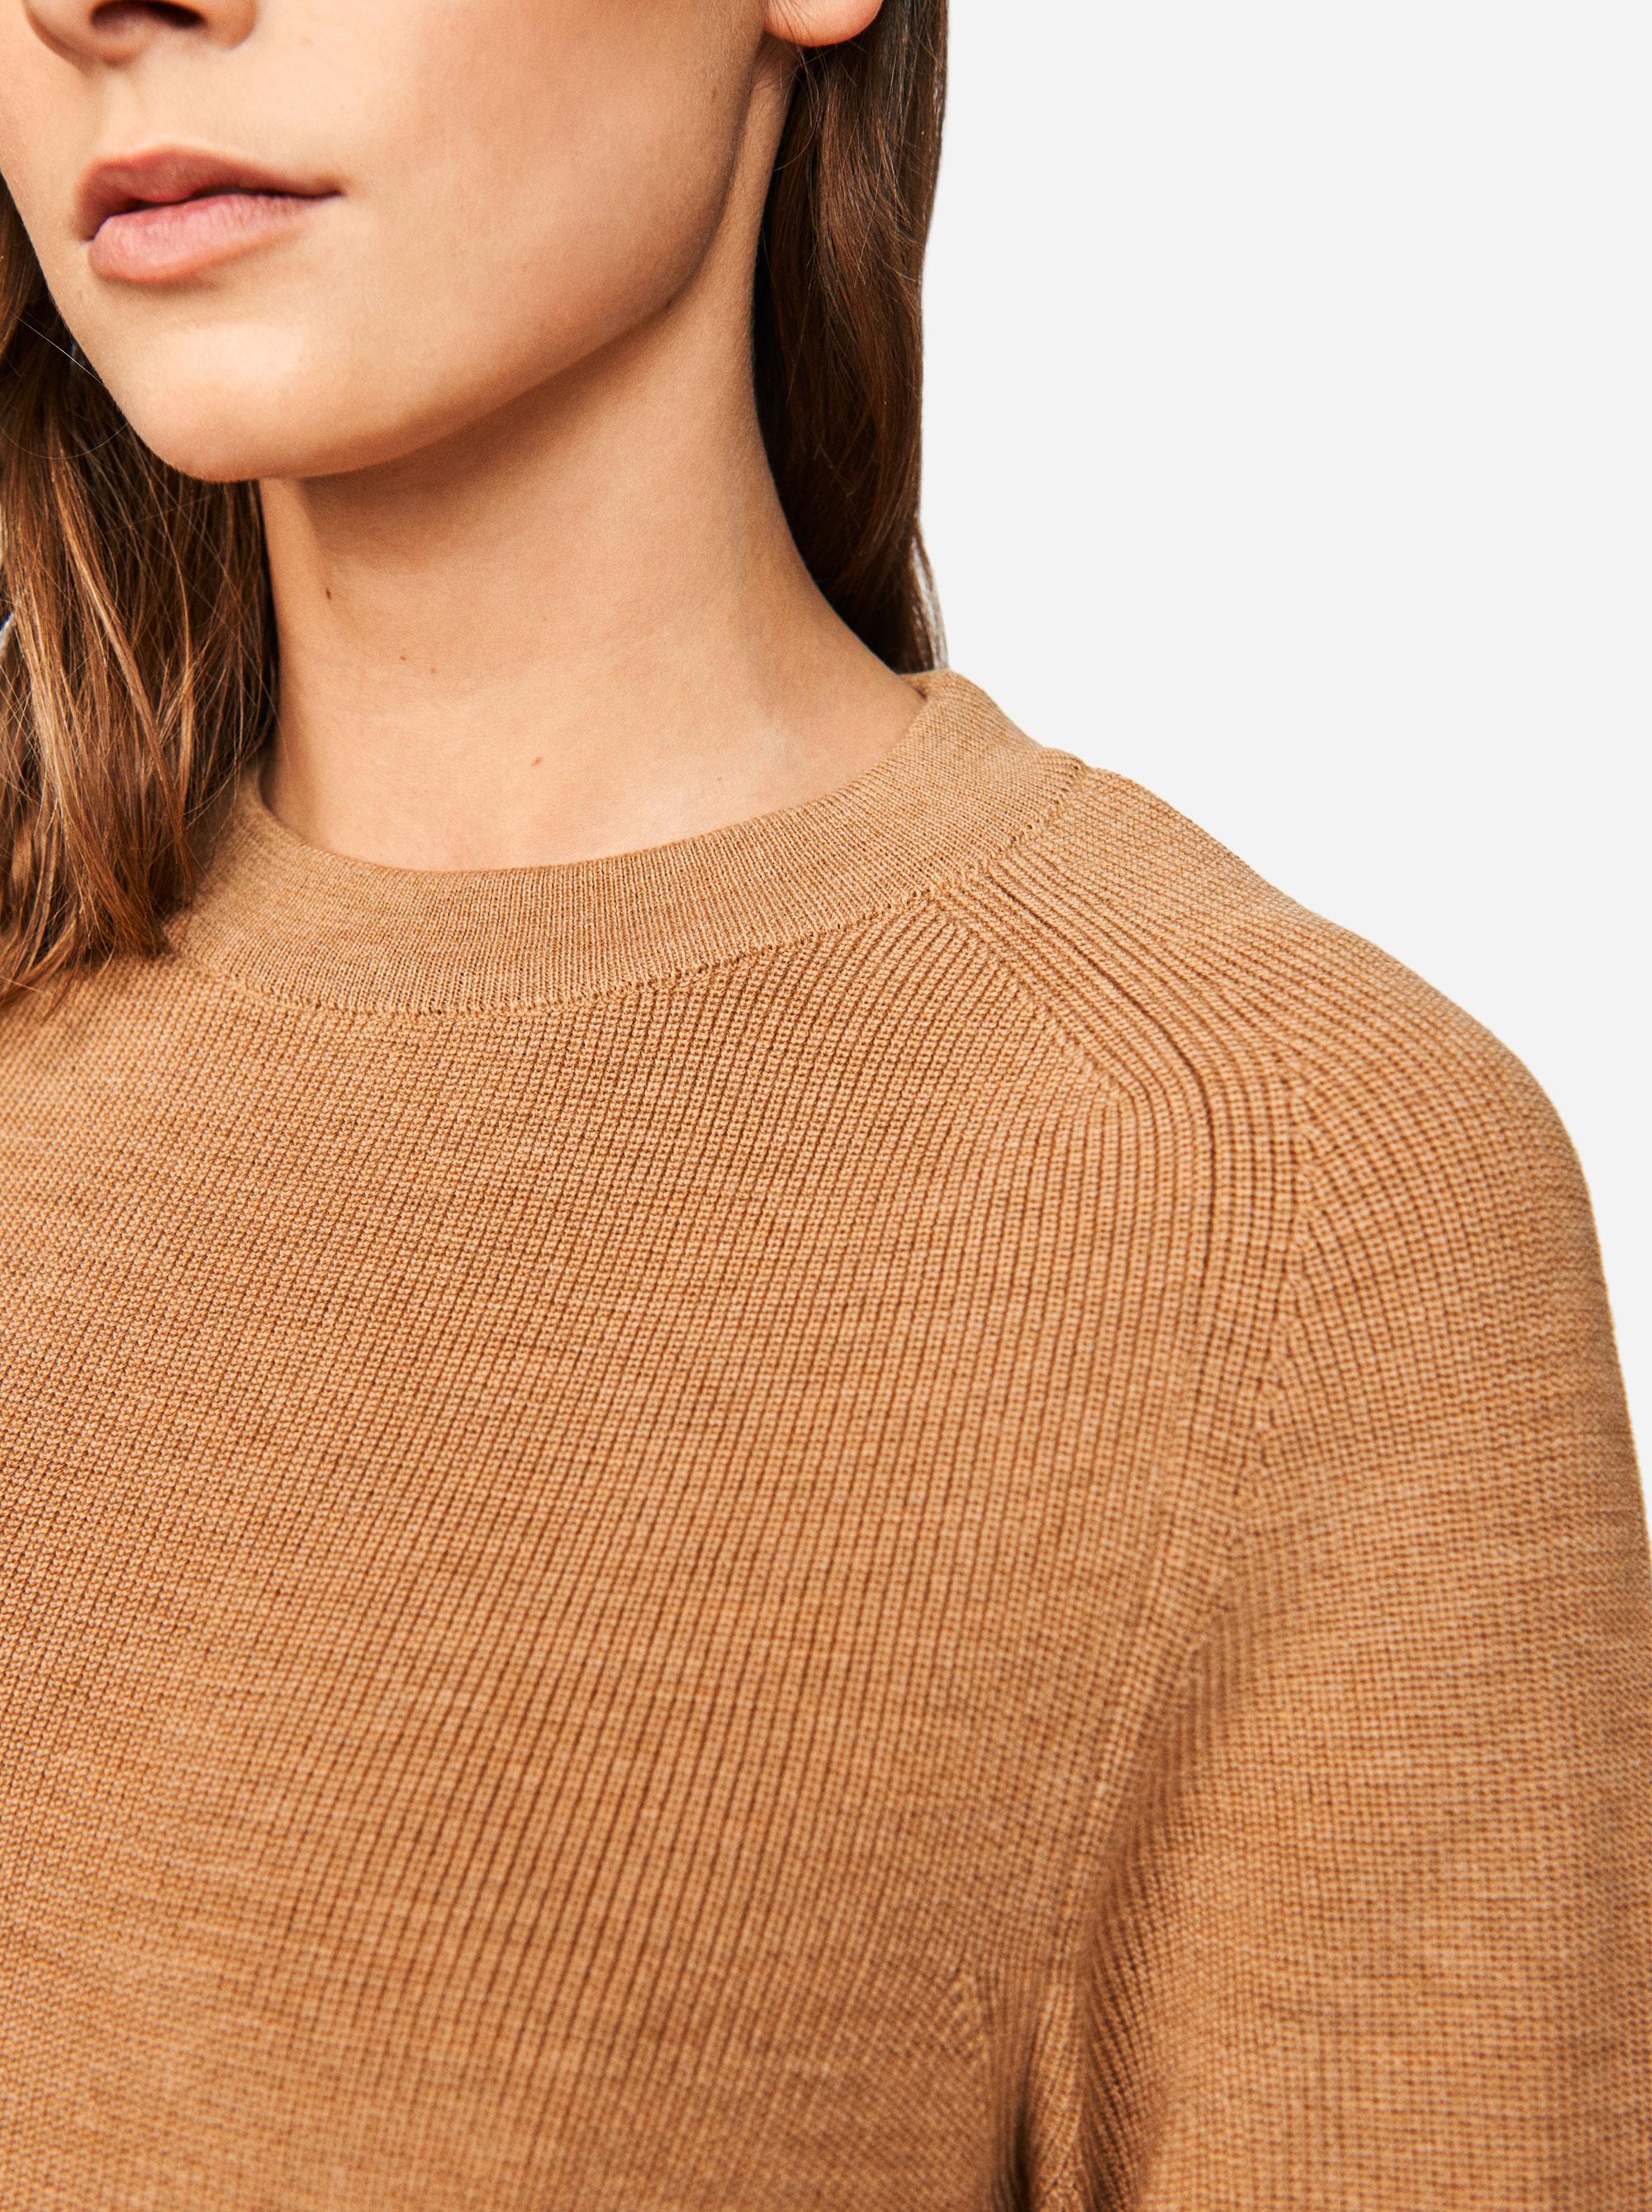 Teym - Crewneck - The Merino Sweater - Women - Camel - 2